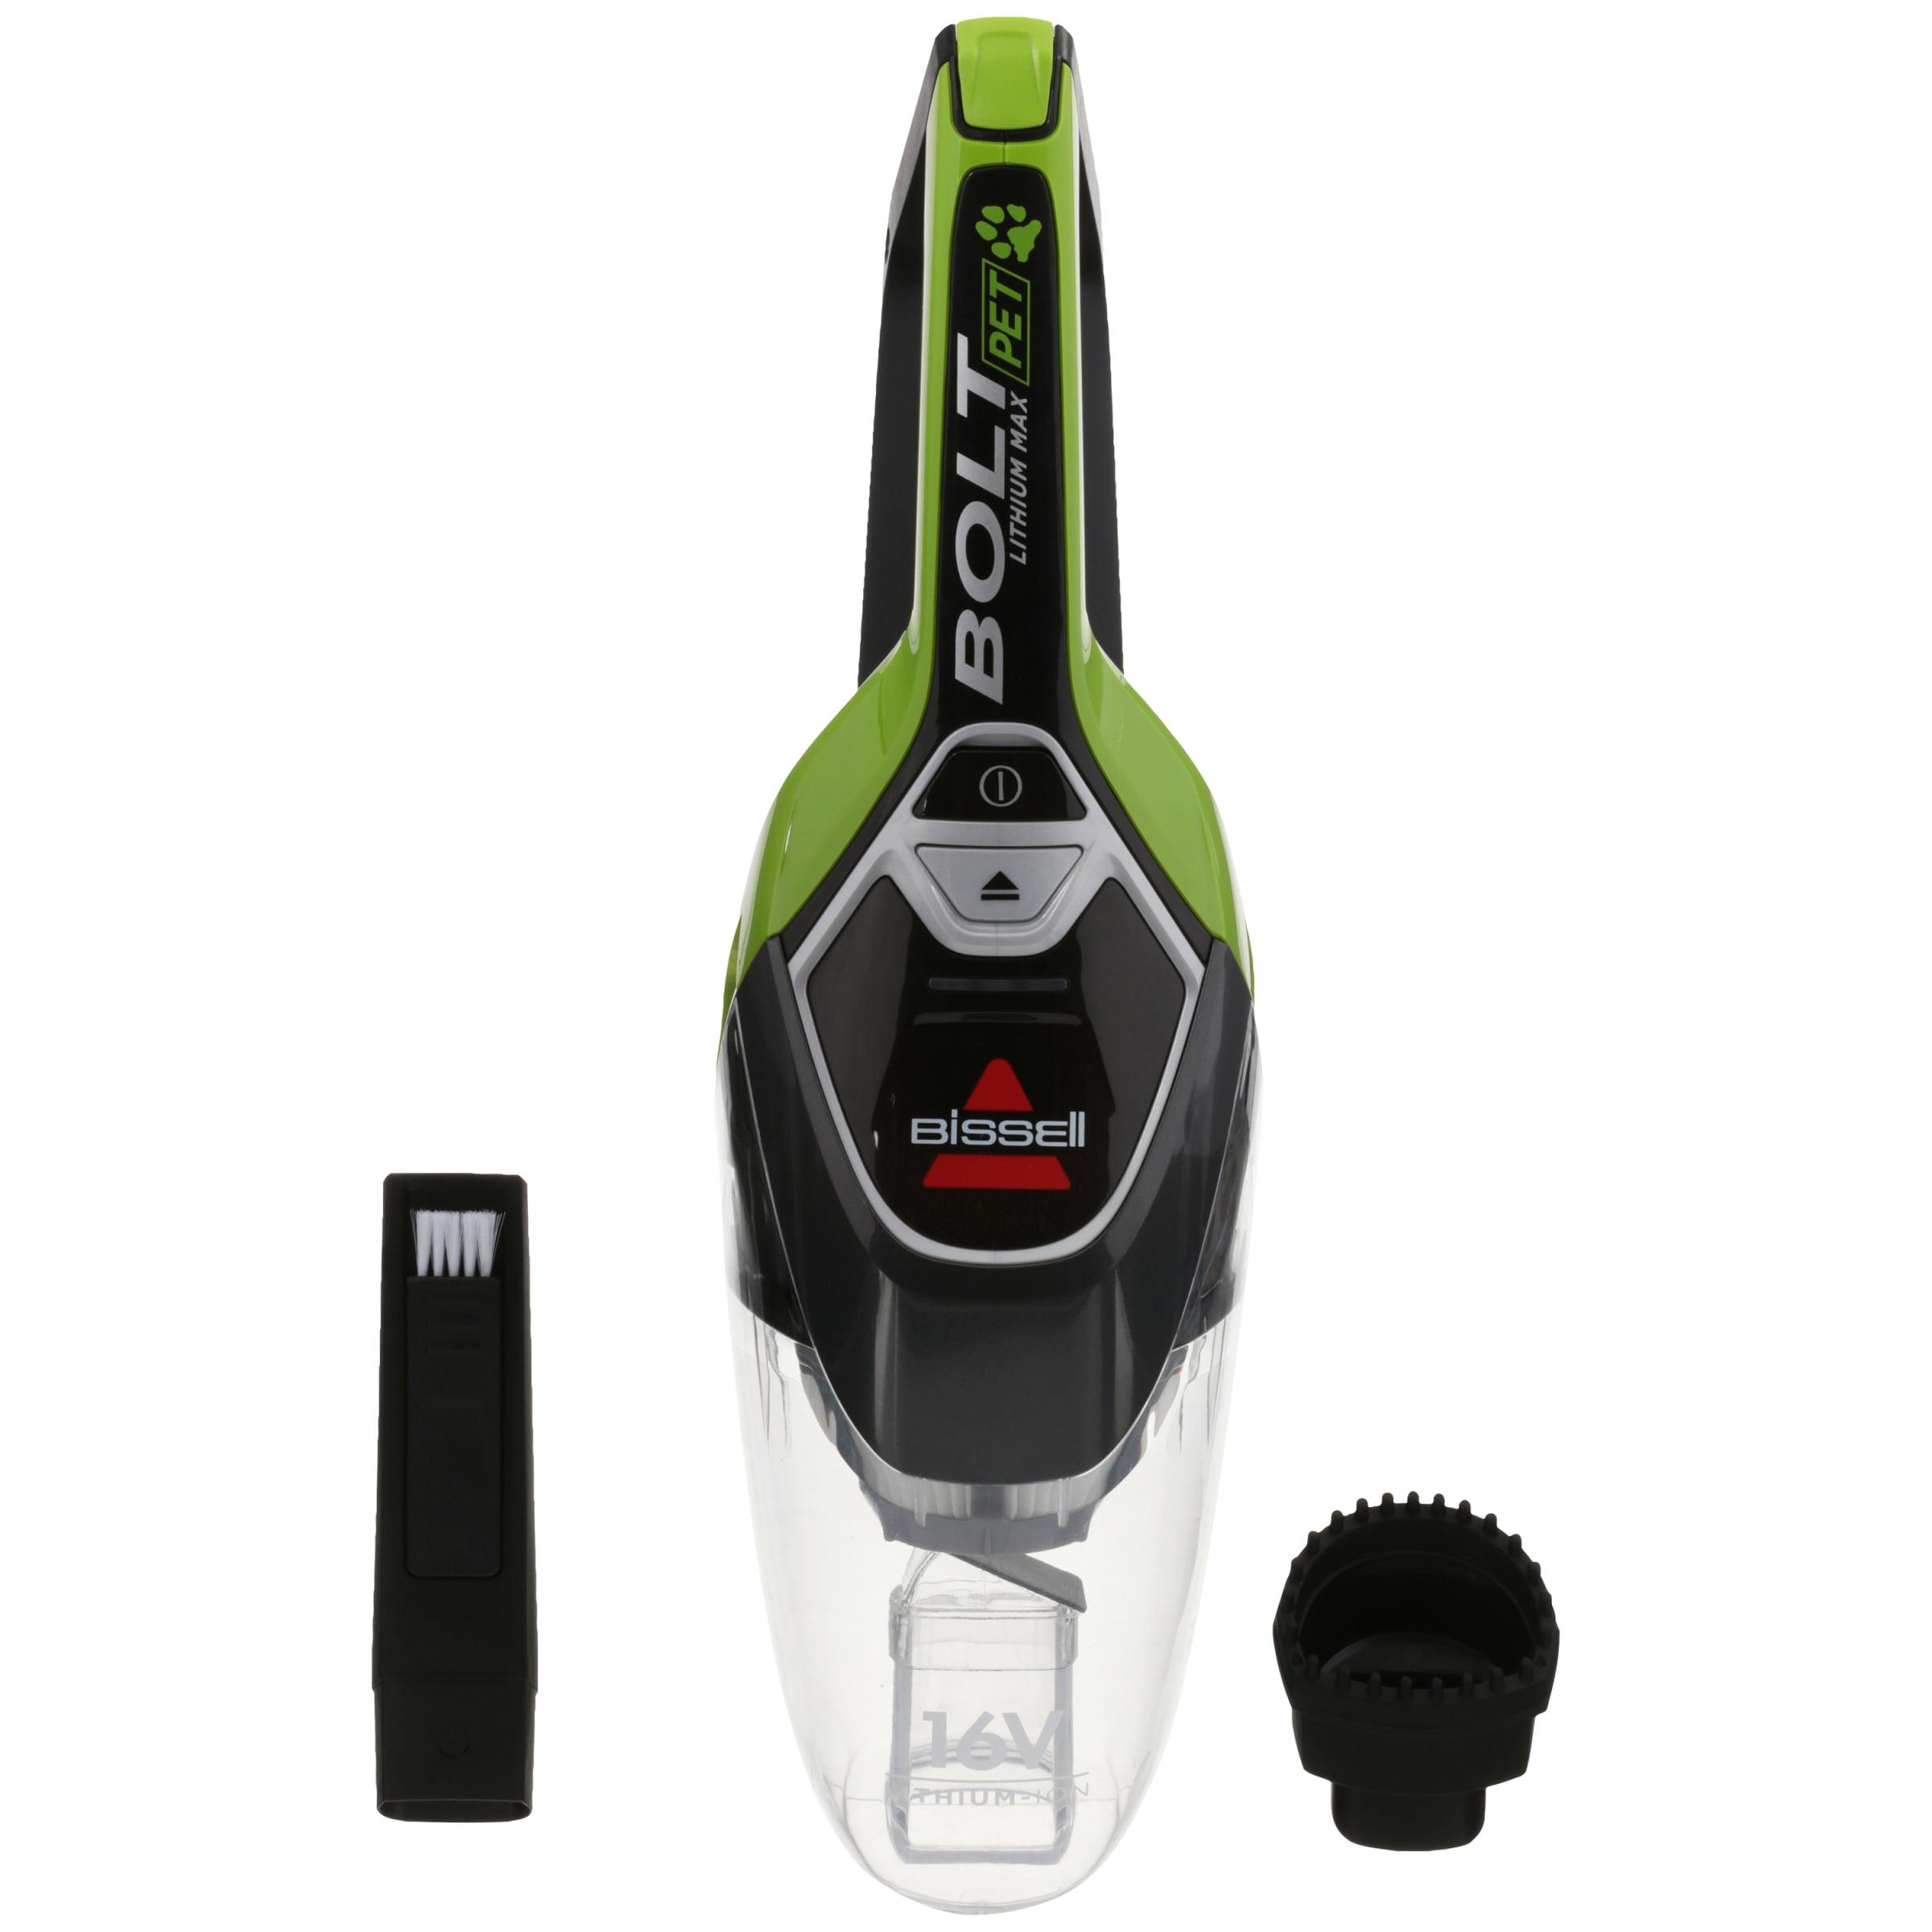 Bissell® Bolt™ Lithium Max Pet Cordless Hand Vacuum